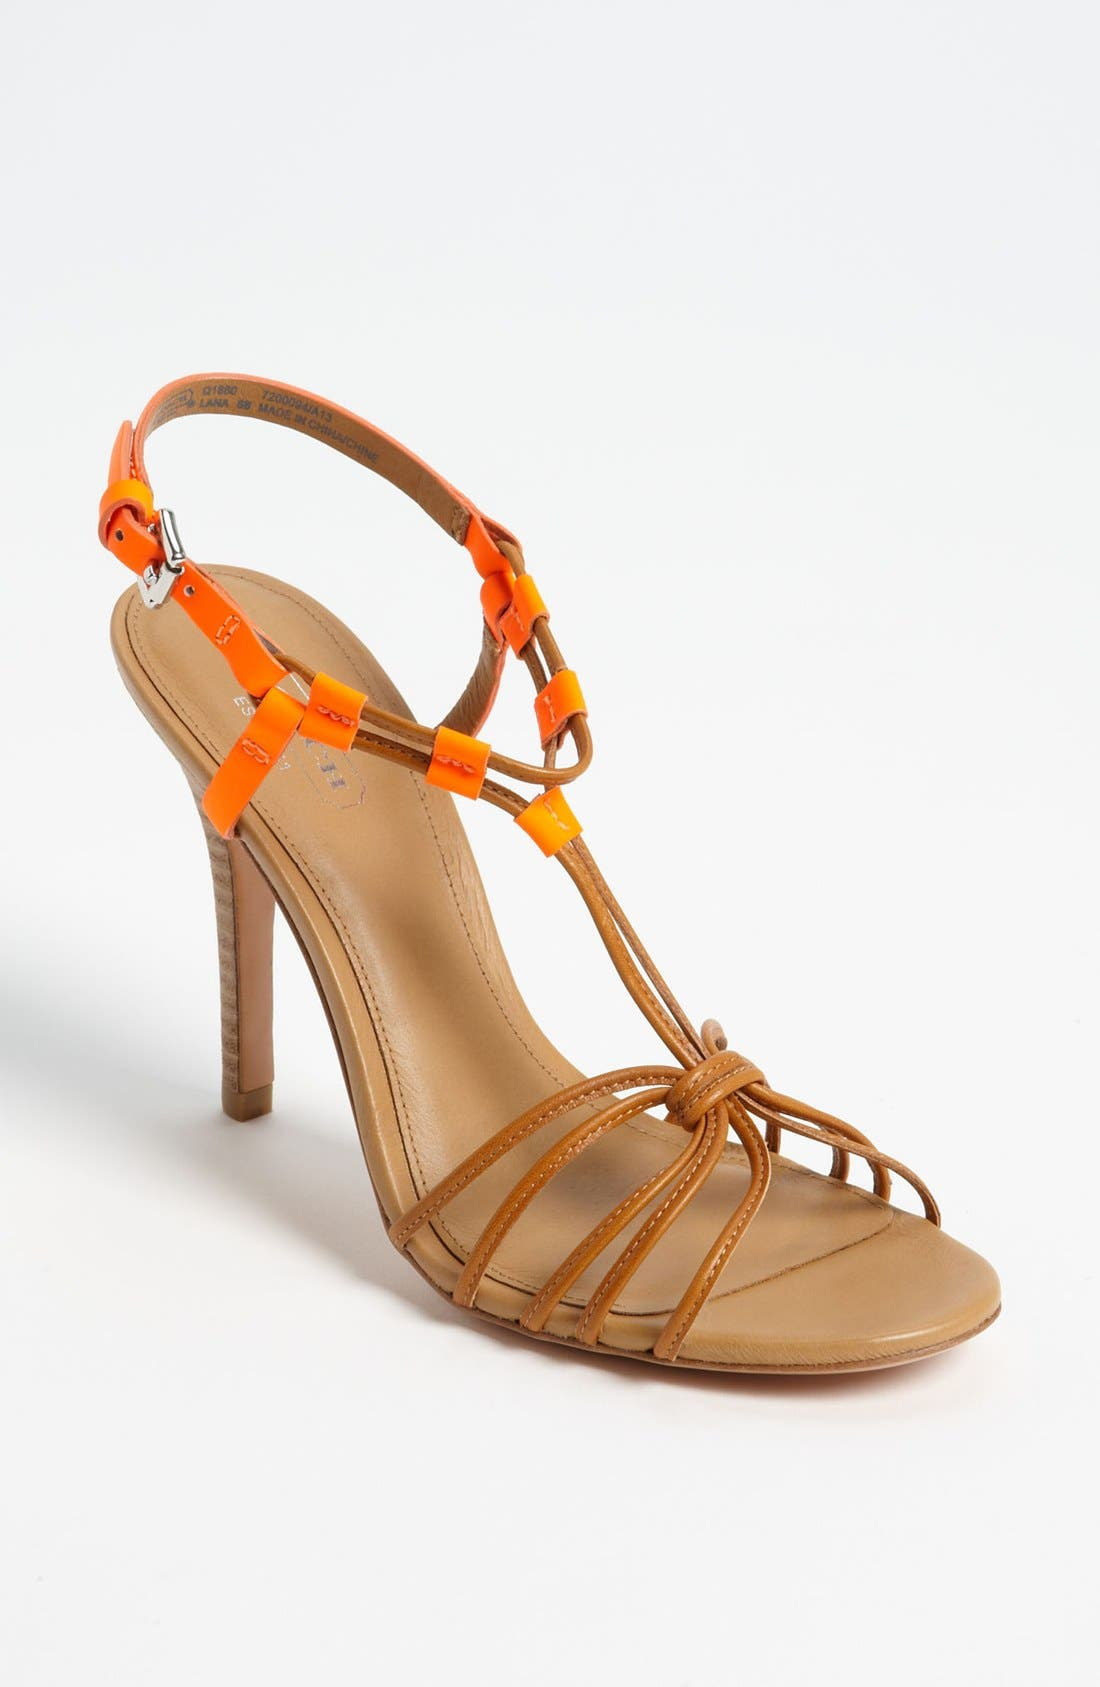 Main Image - COACH 'Lana' Sandal